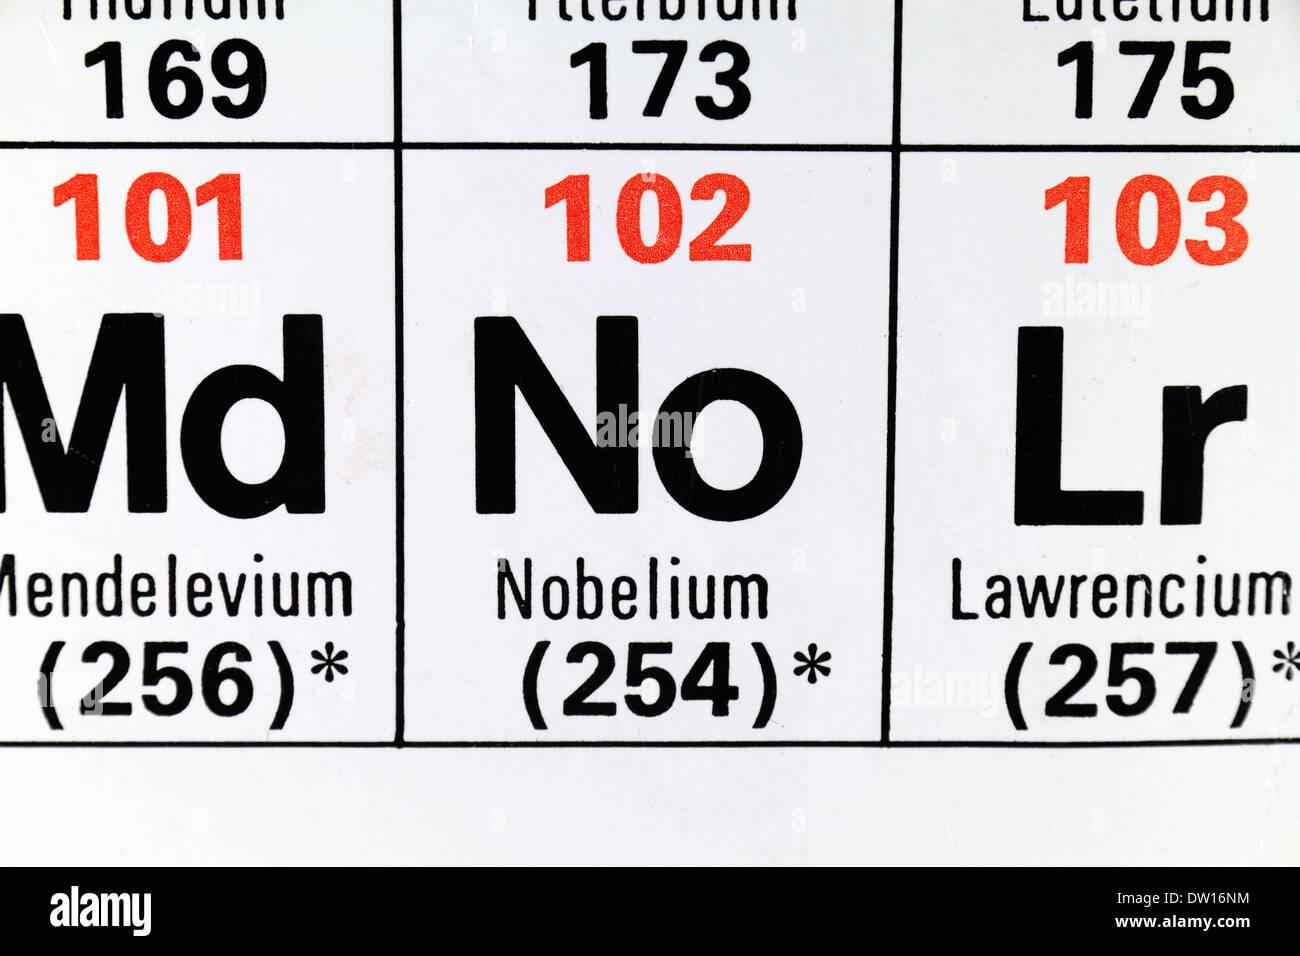 Nobelium no as it appears on the periodic table stock photo nobelium no as it appears on the periodic table buycottarizona